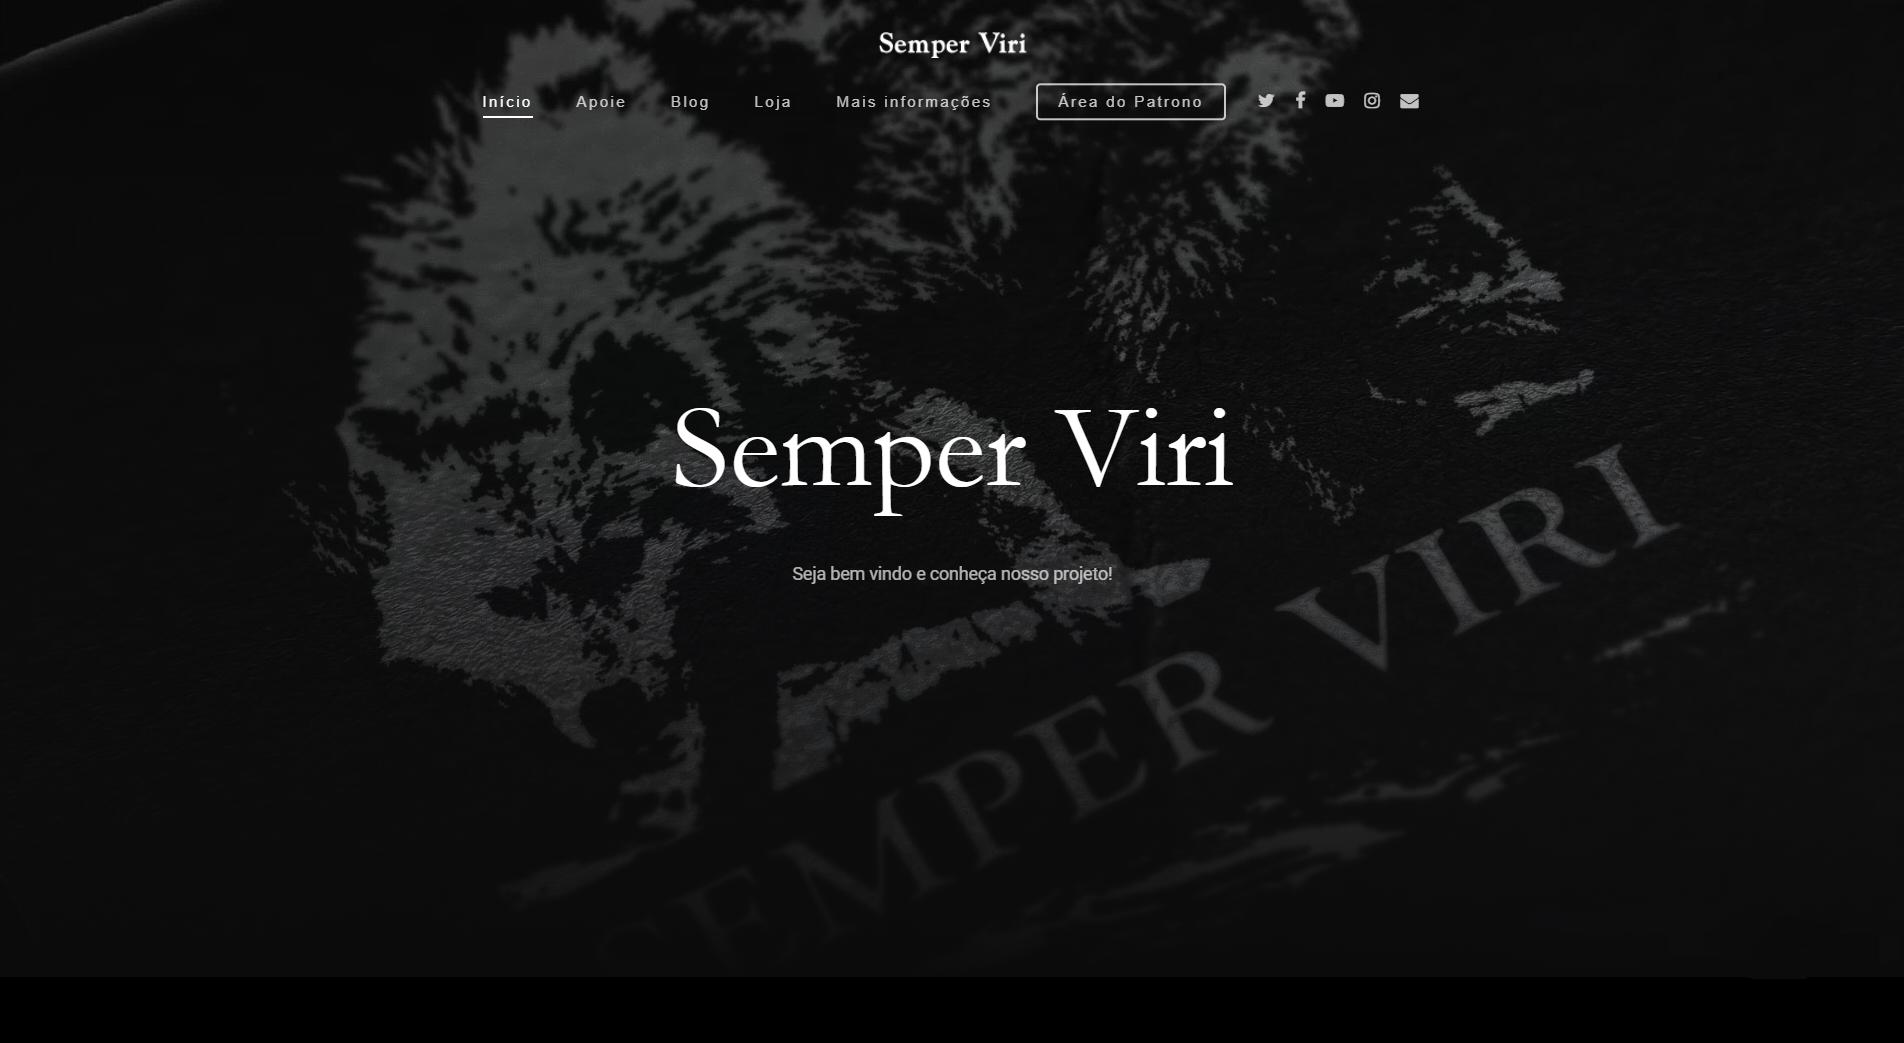 Semper Viri